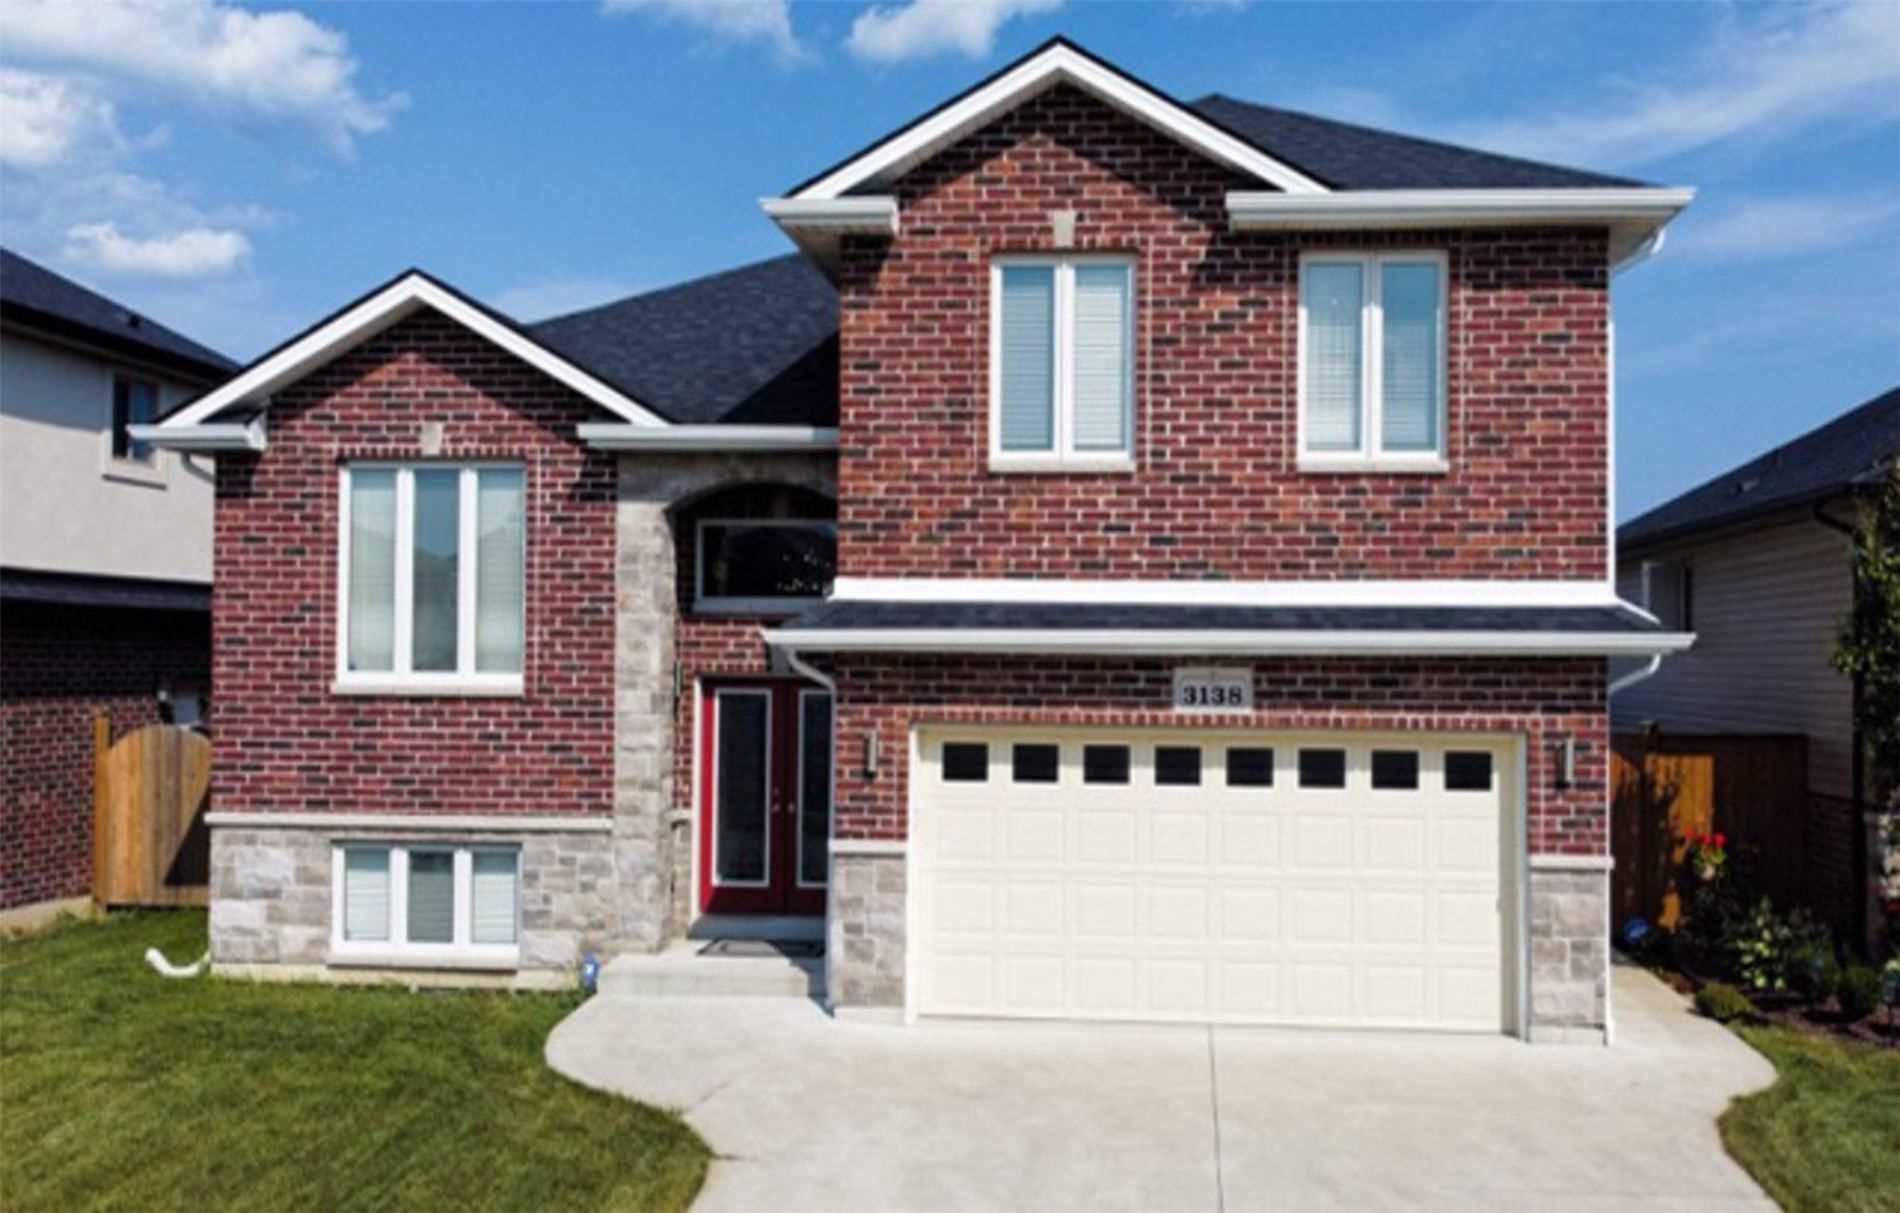 3138 Troup Cres, Windsor, Ontario N8R0A3, 3 Bedrooms Bedrooms, ,3 BathroomsBathrooms,Detached,For Sale,Troup,X5366386